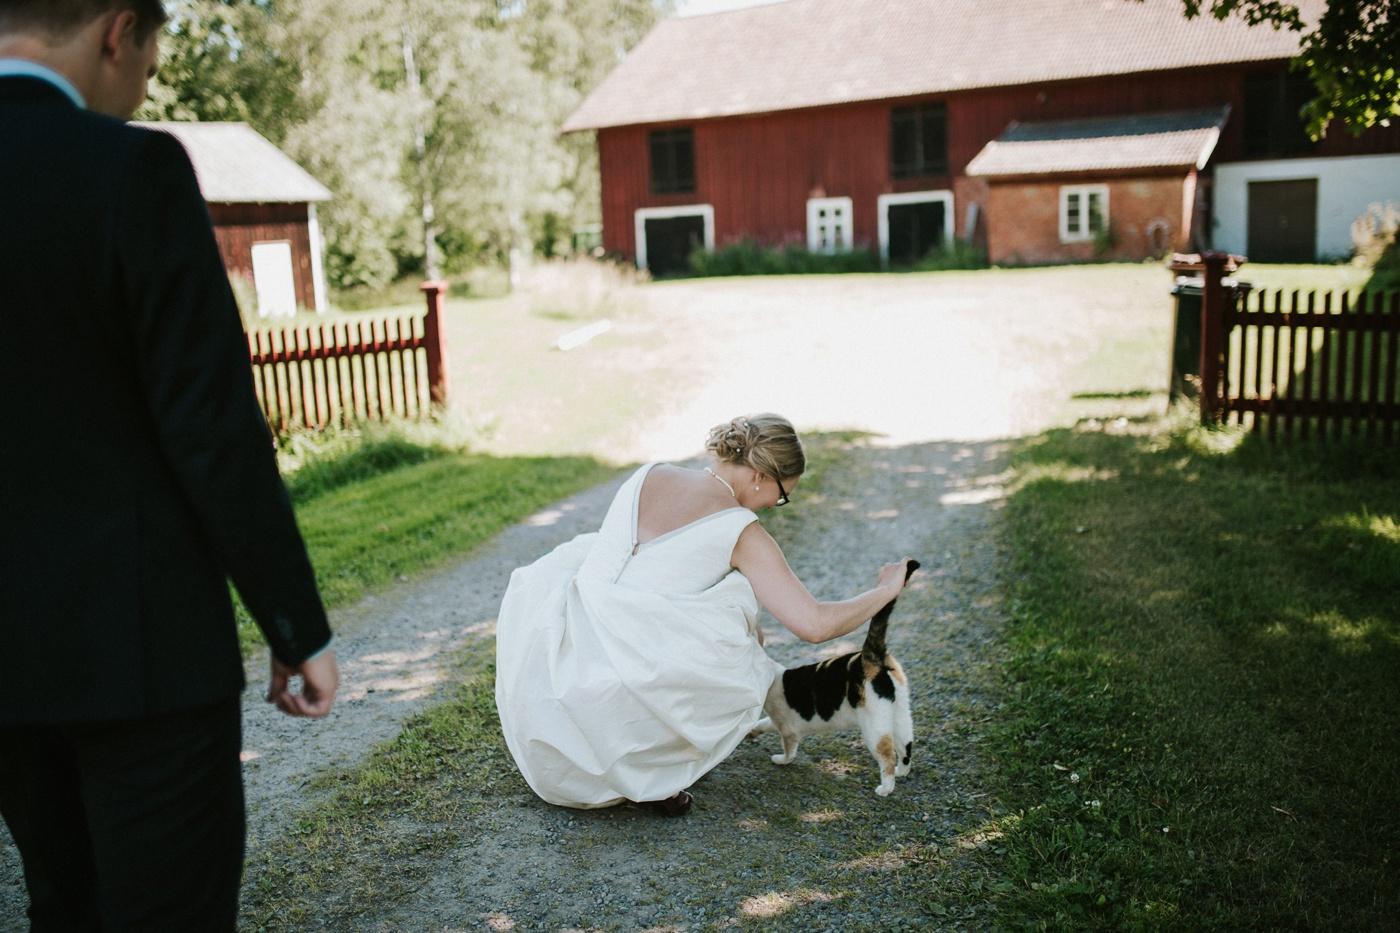 ceciliajoakim_sweden-countryside-summer-wedding_melbourne-fun-quirky-wedding-photography_50